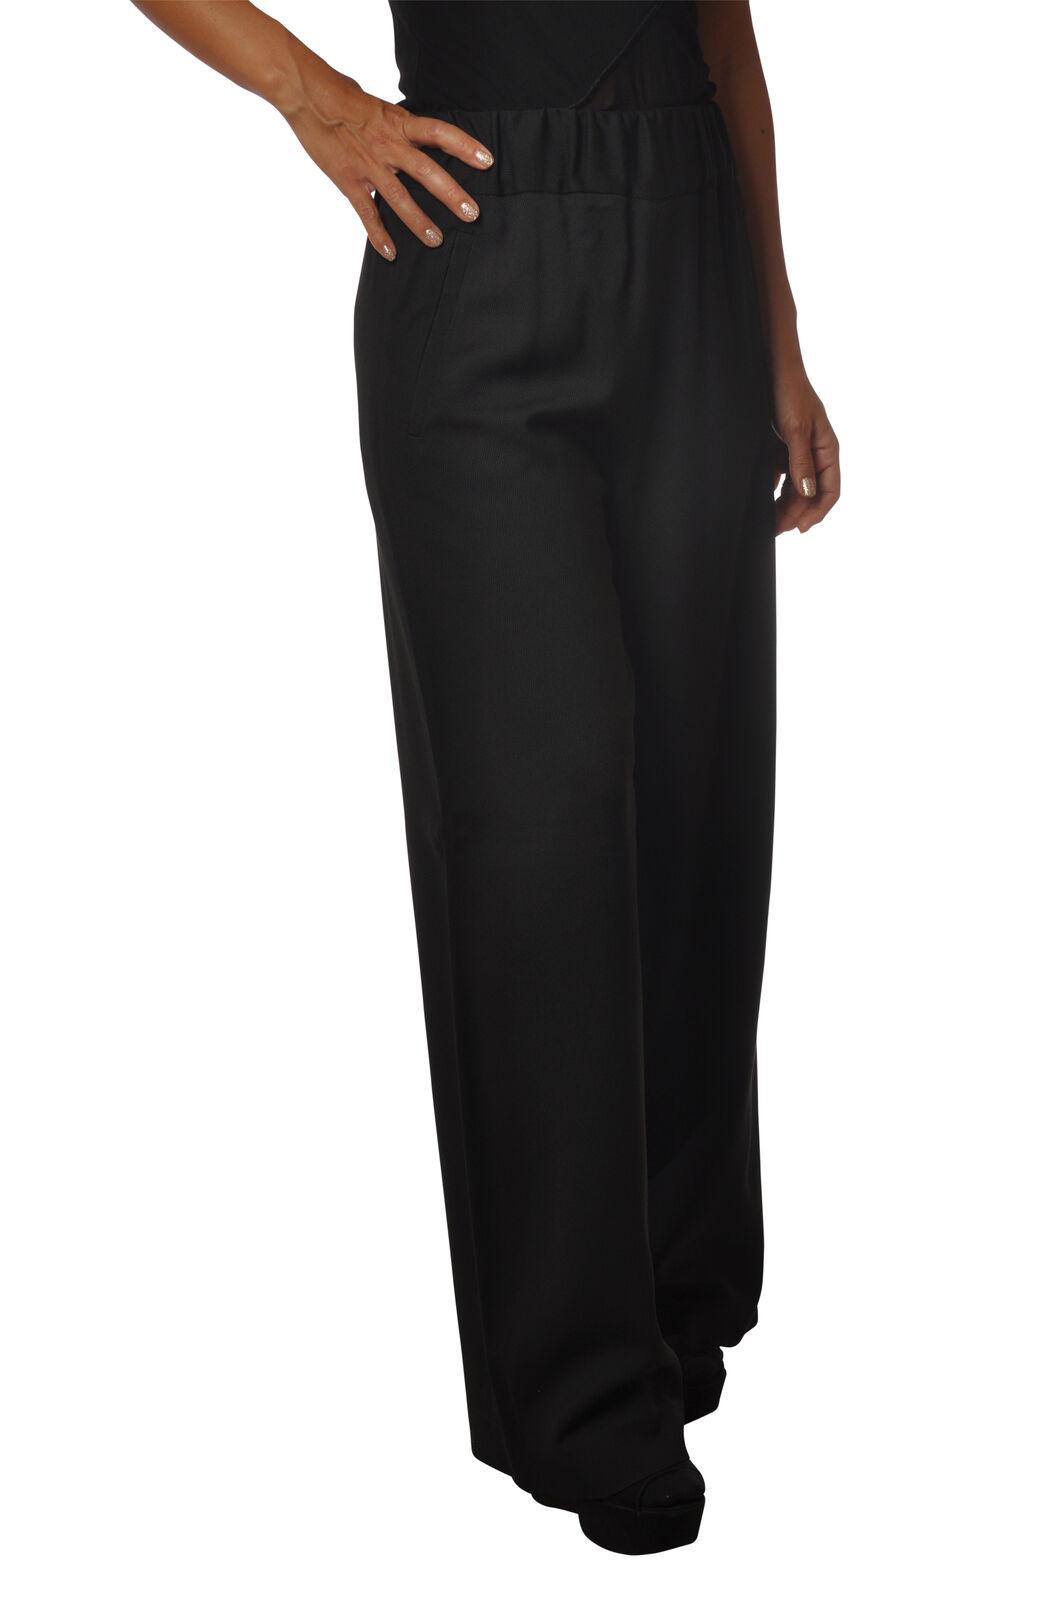 Meme -  Pantaloni-Pantaloni - mujer - negro - 5485311M184503  calidad oficial